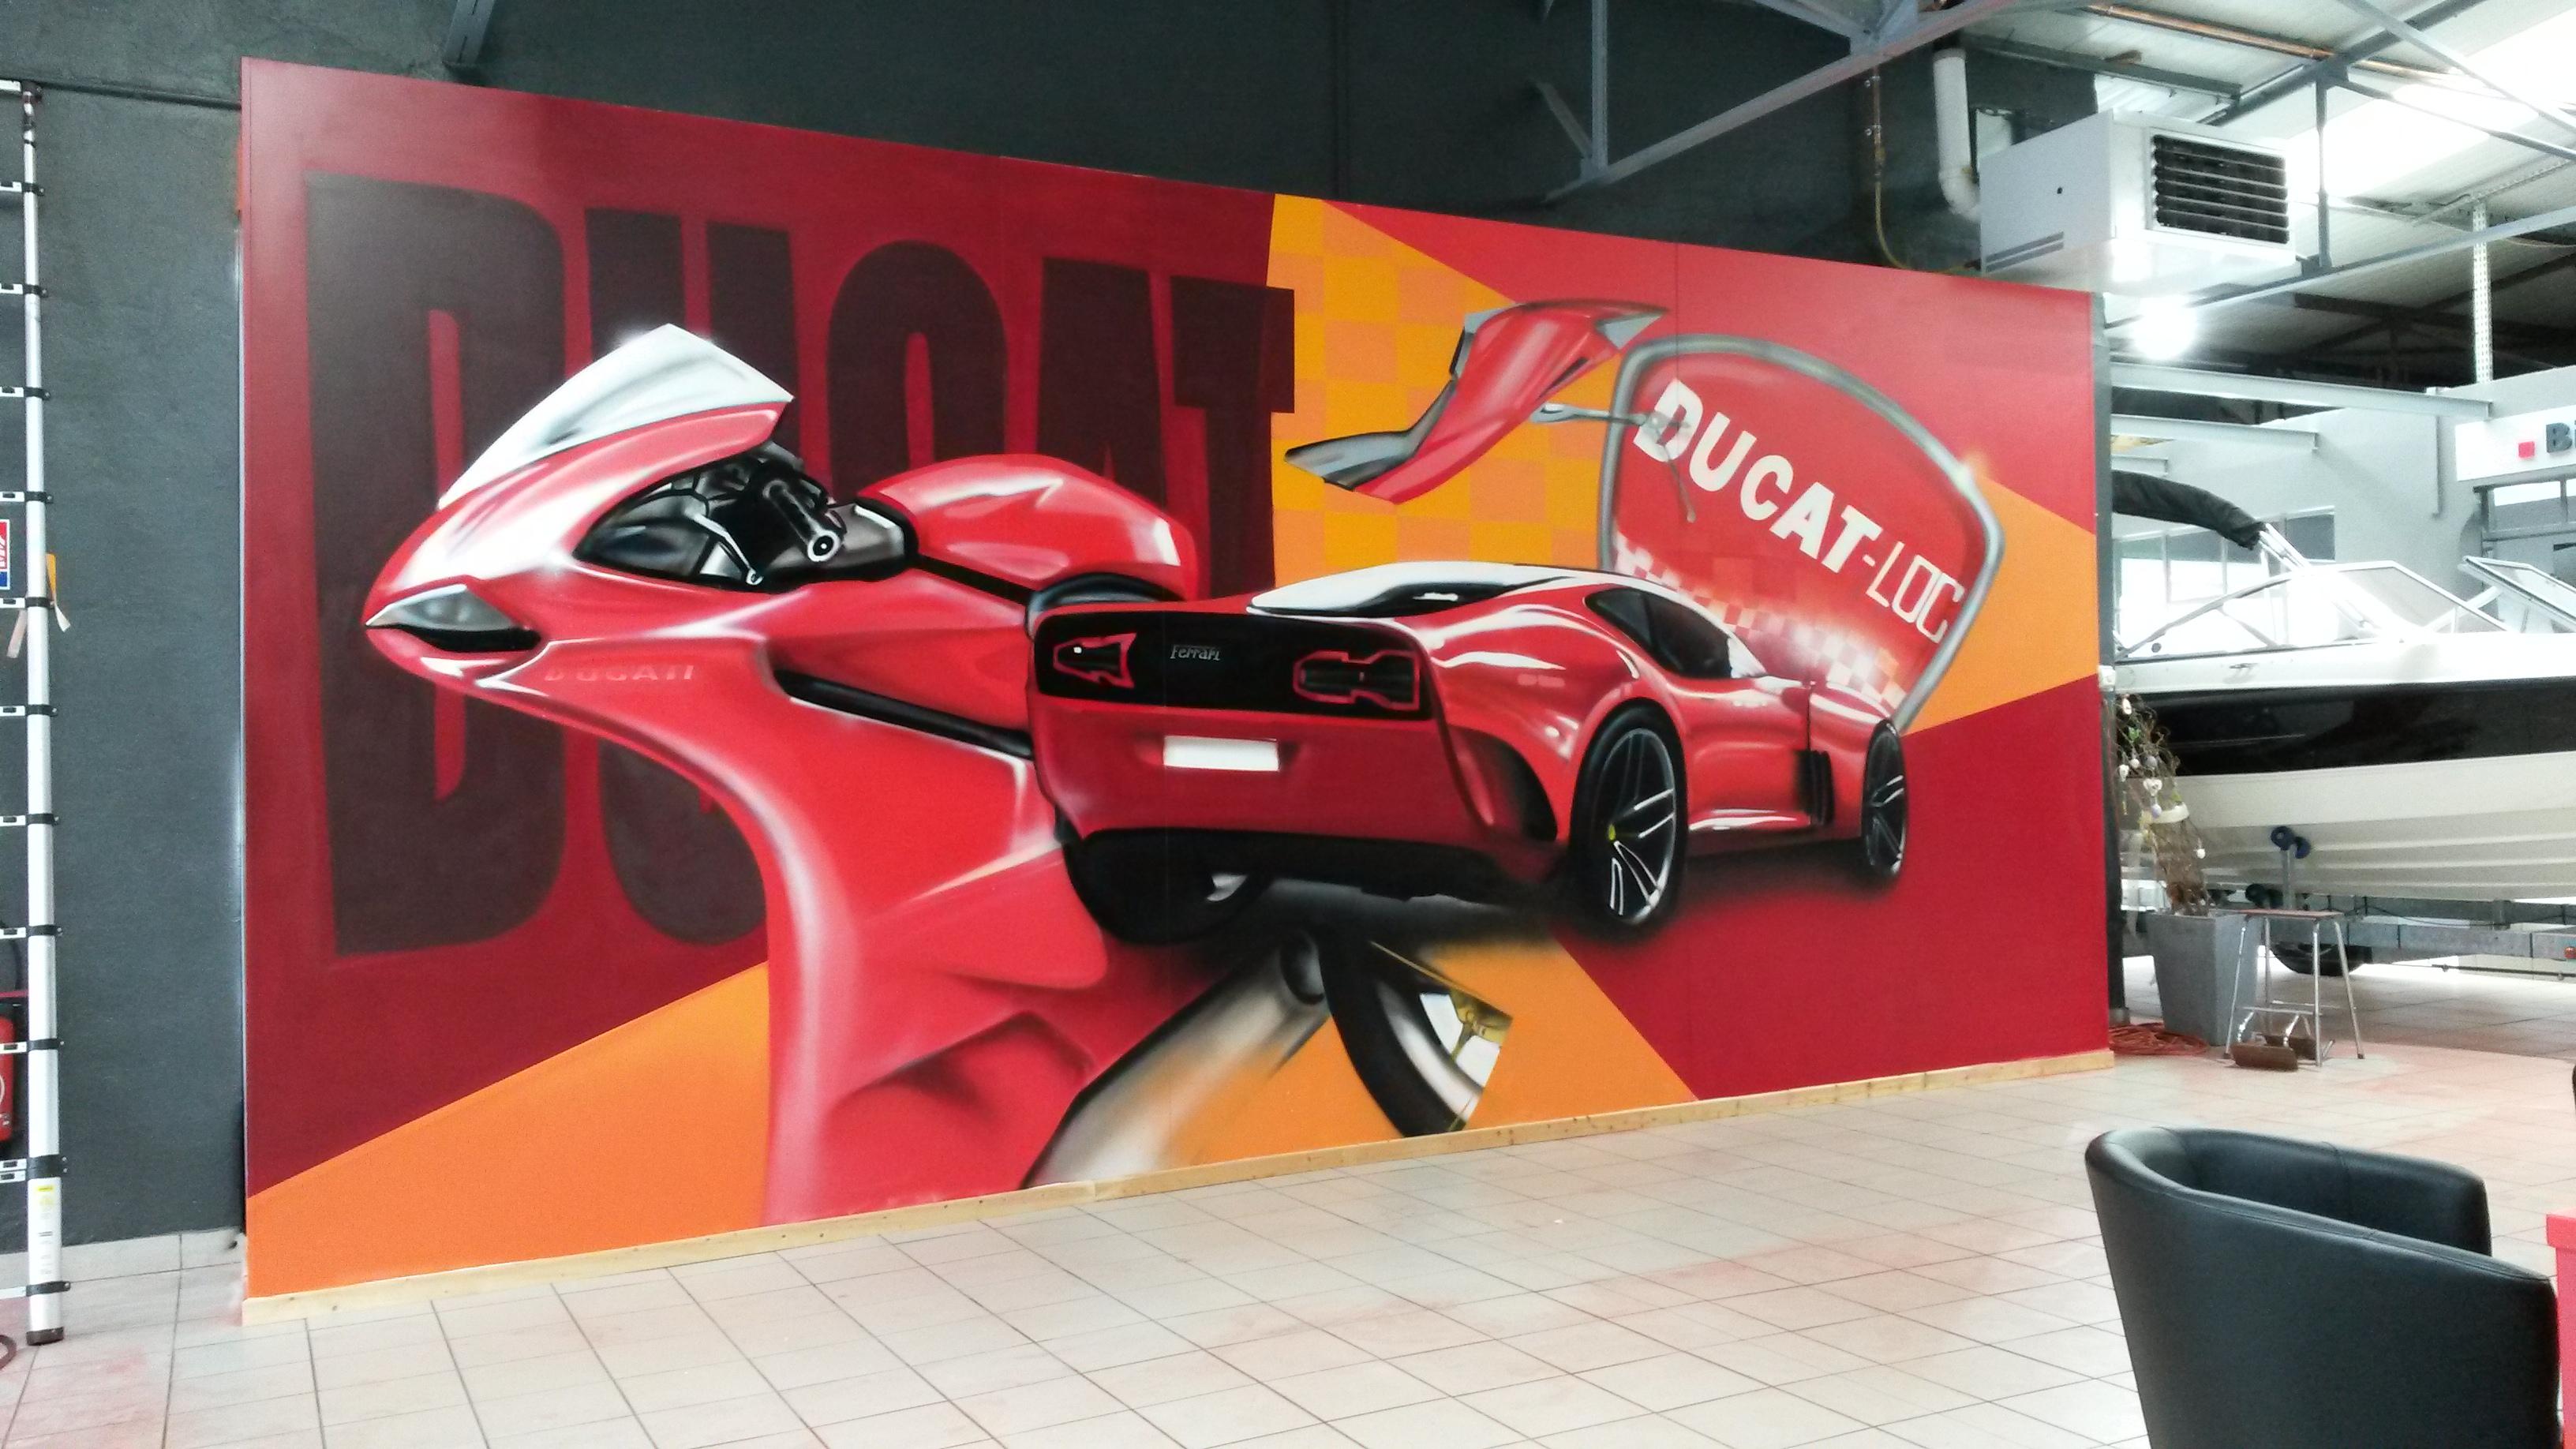 Ducatloc Ducati